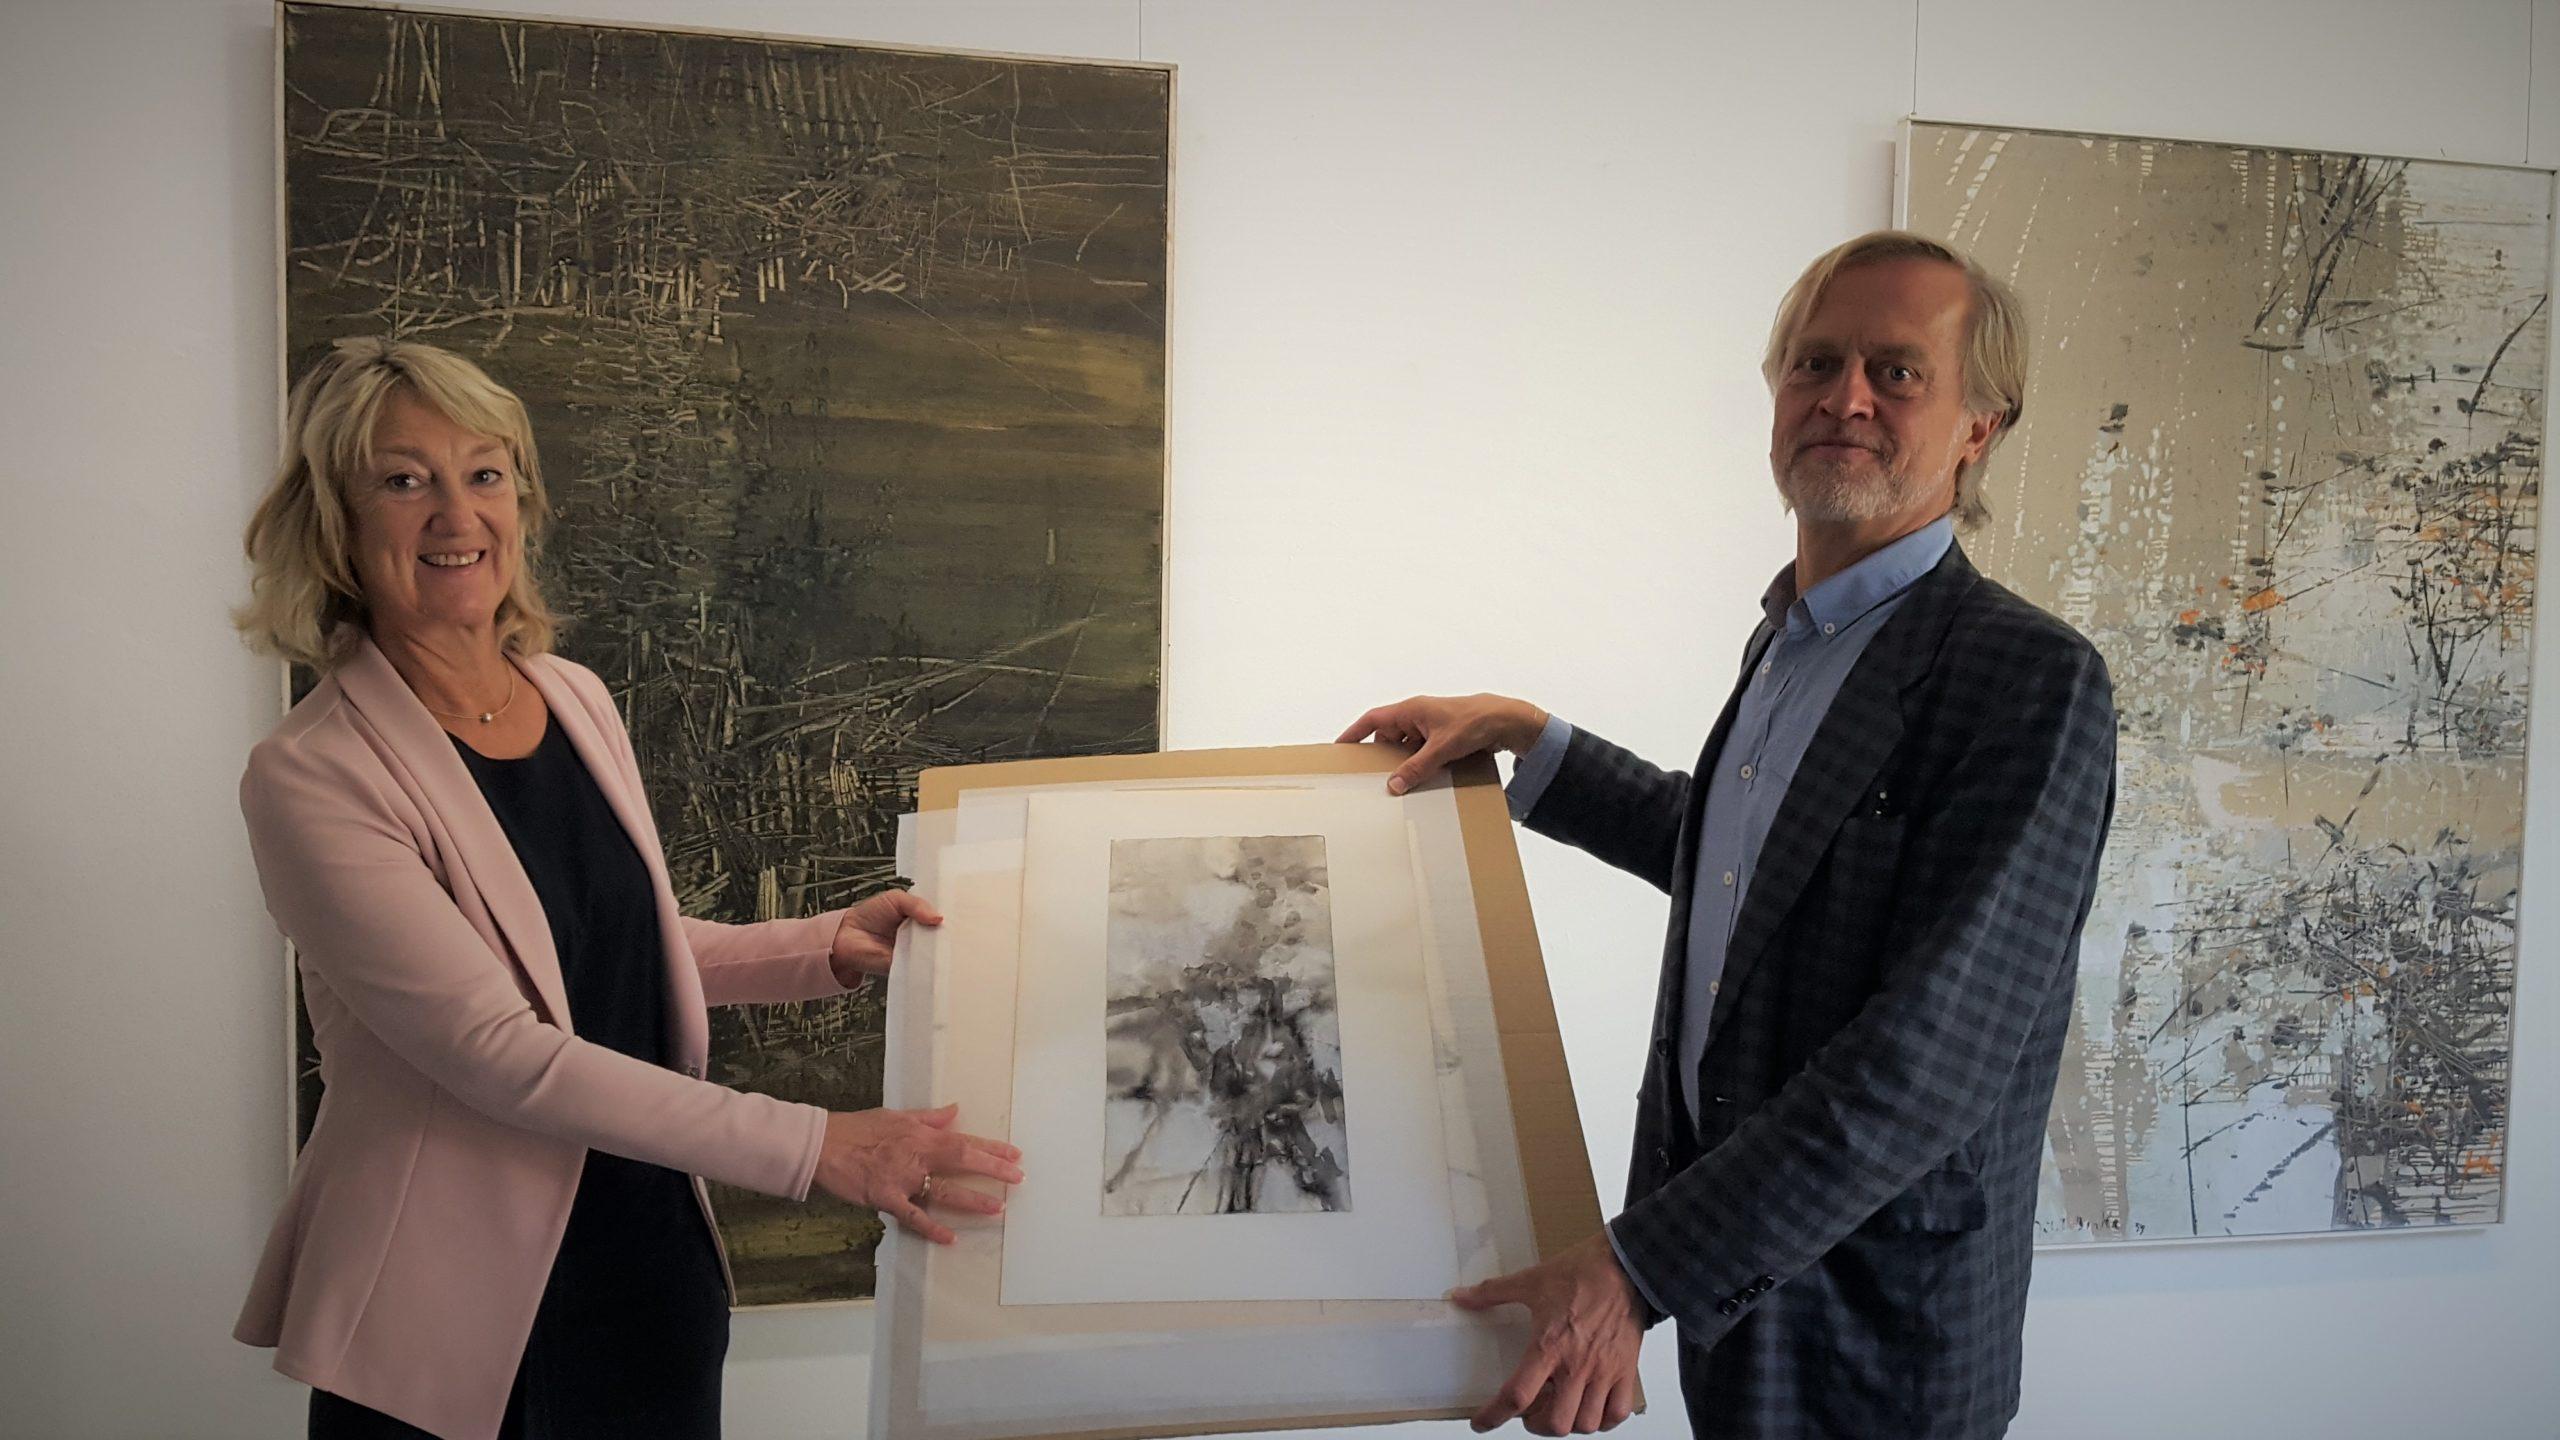 Der Kölner Sammler Adrian Croon hat dem Kunstmuseum Gelsenkirchen zwei Grafiken des Buerschen Künstlers Hubert Berke geschenkt.